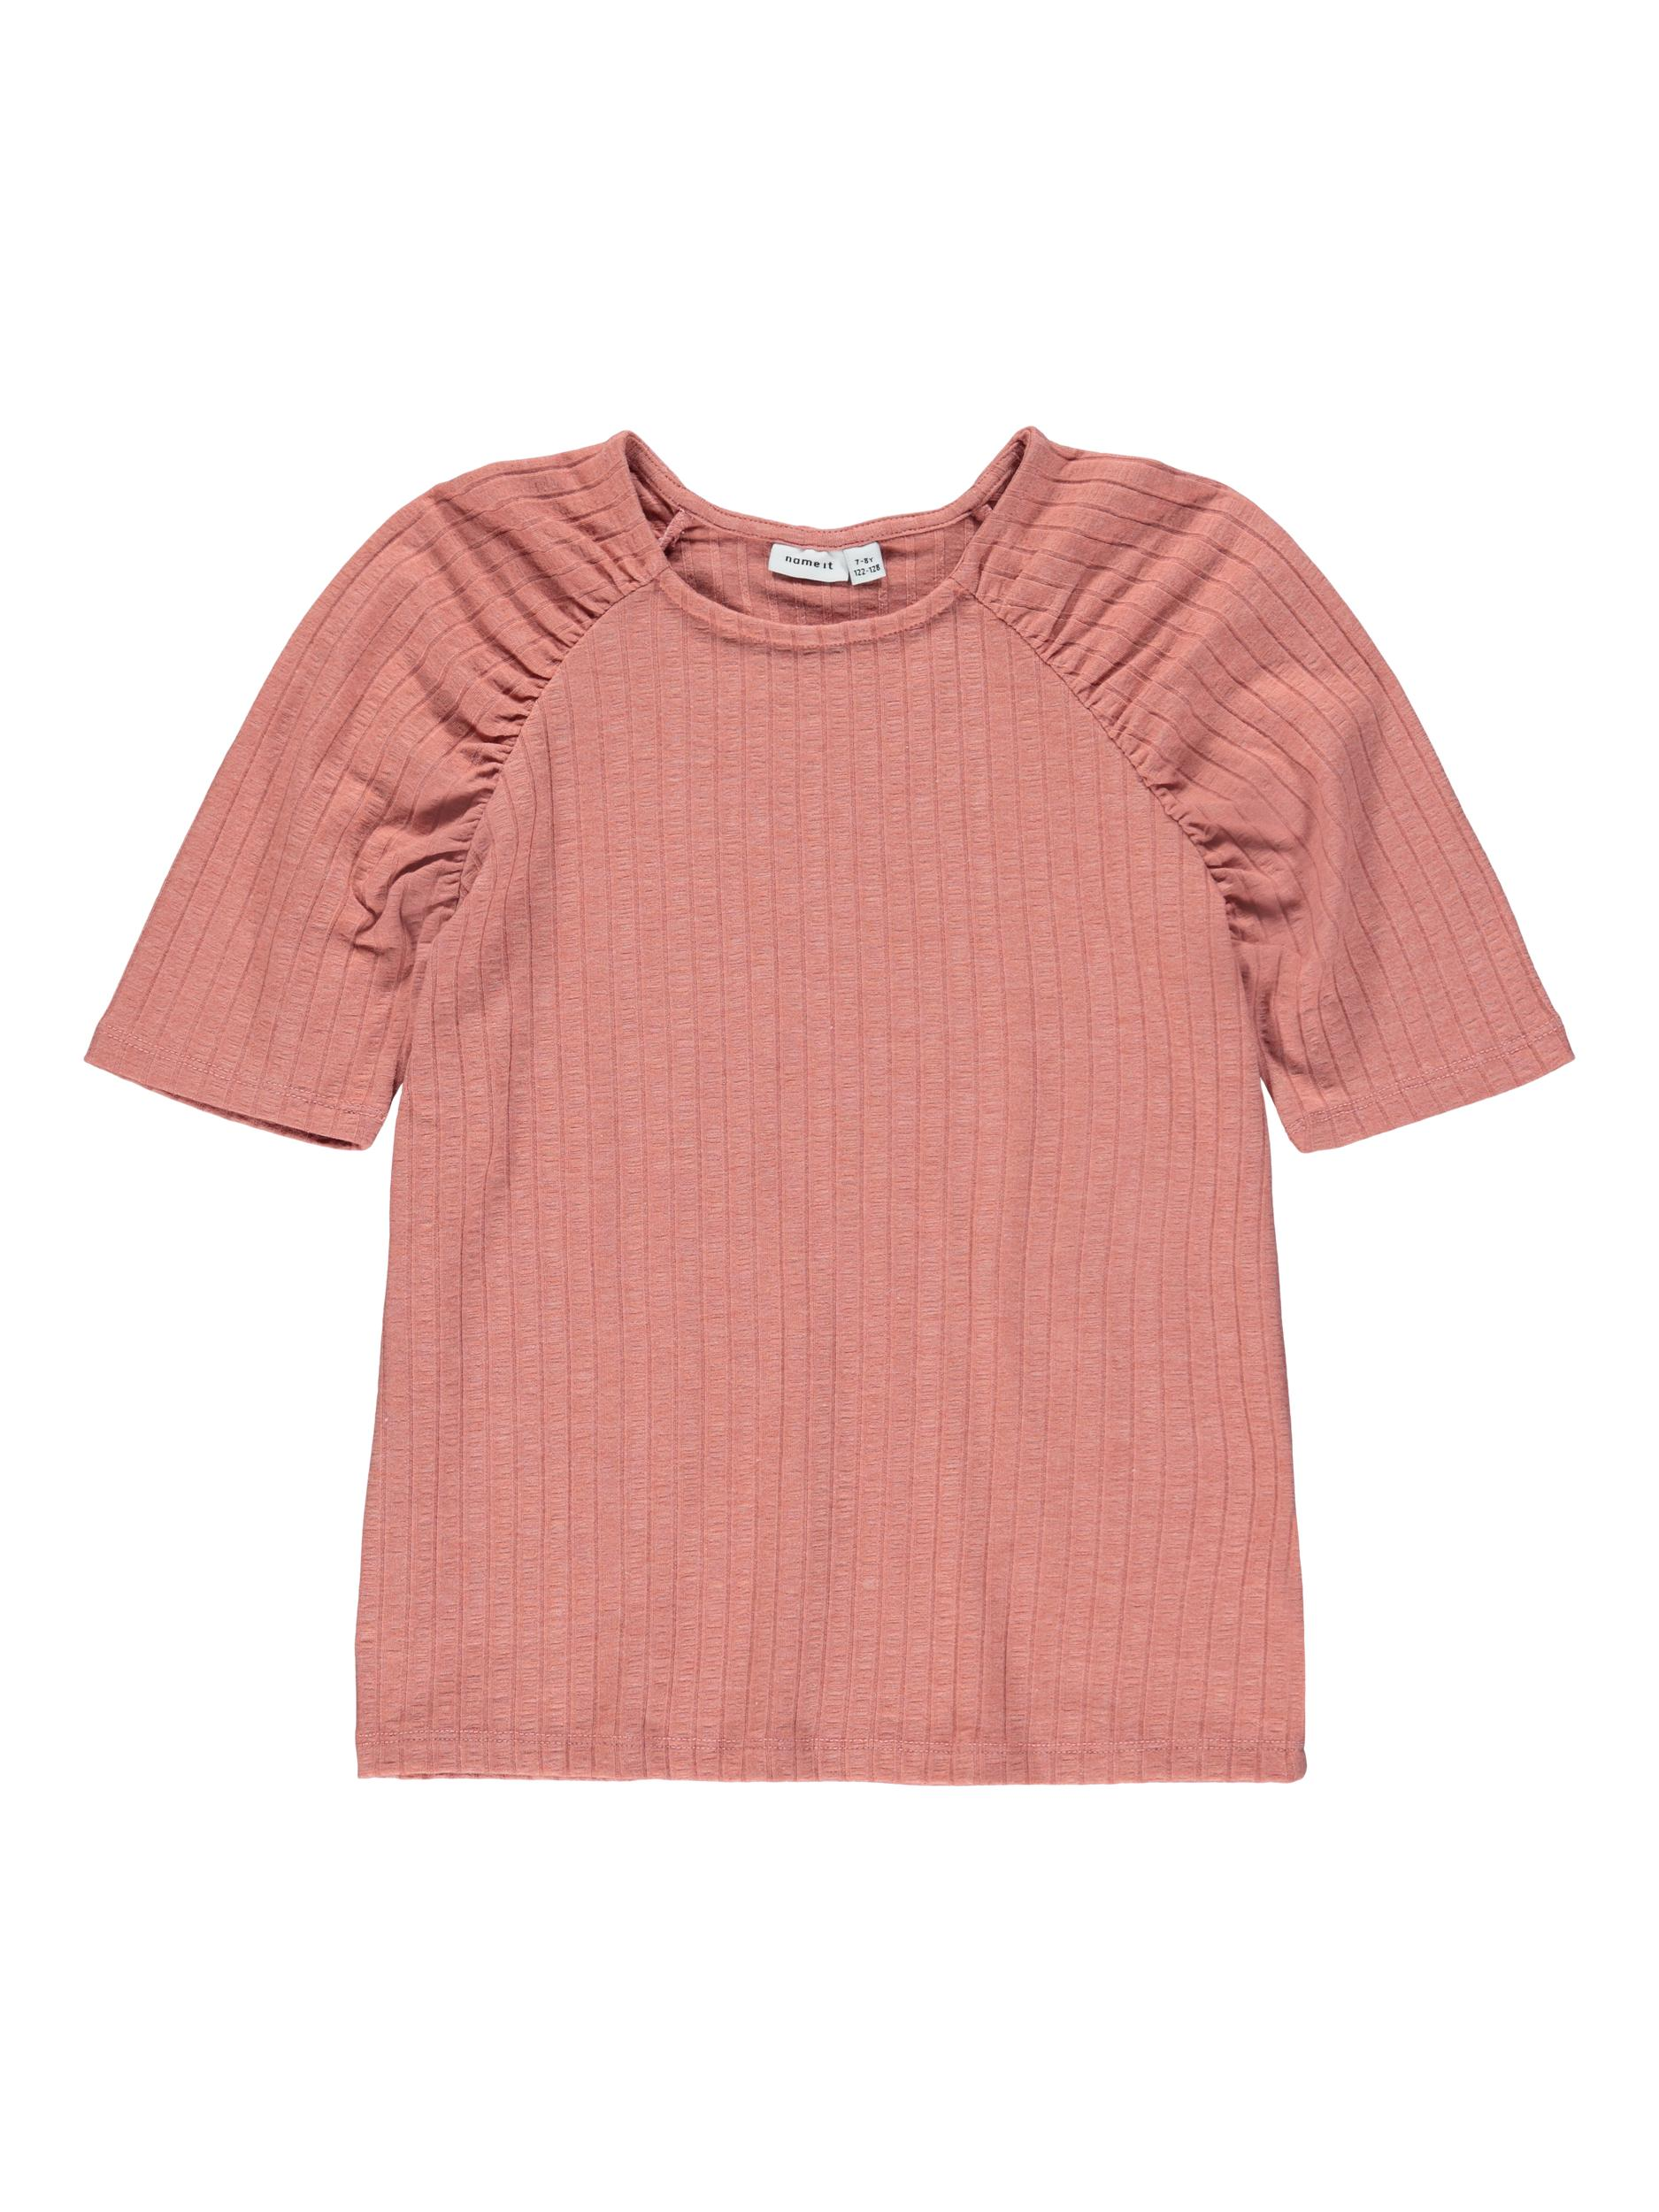 Name It Nolaa SS t-shirt, desert sand, 122-128